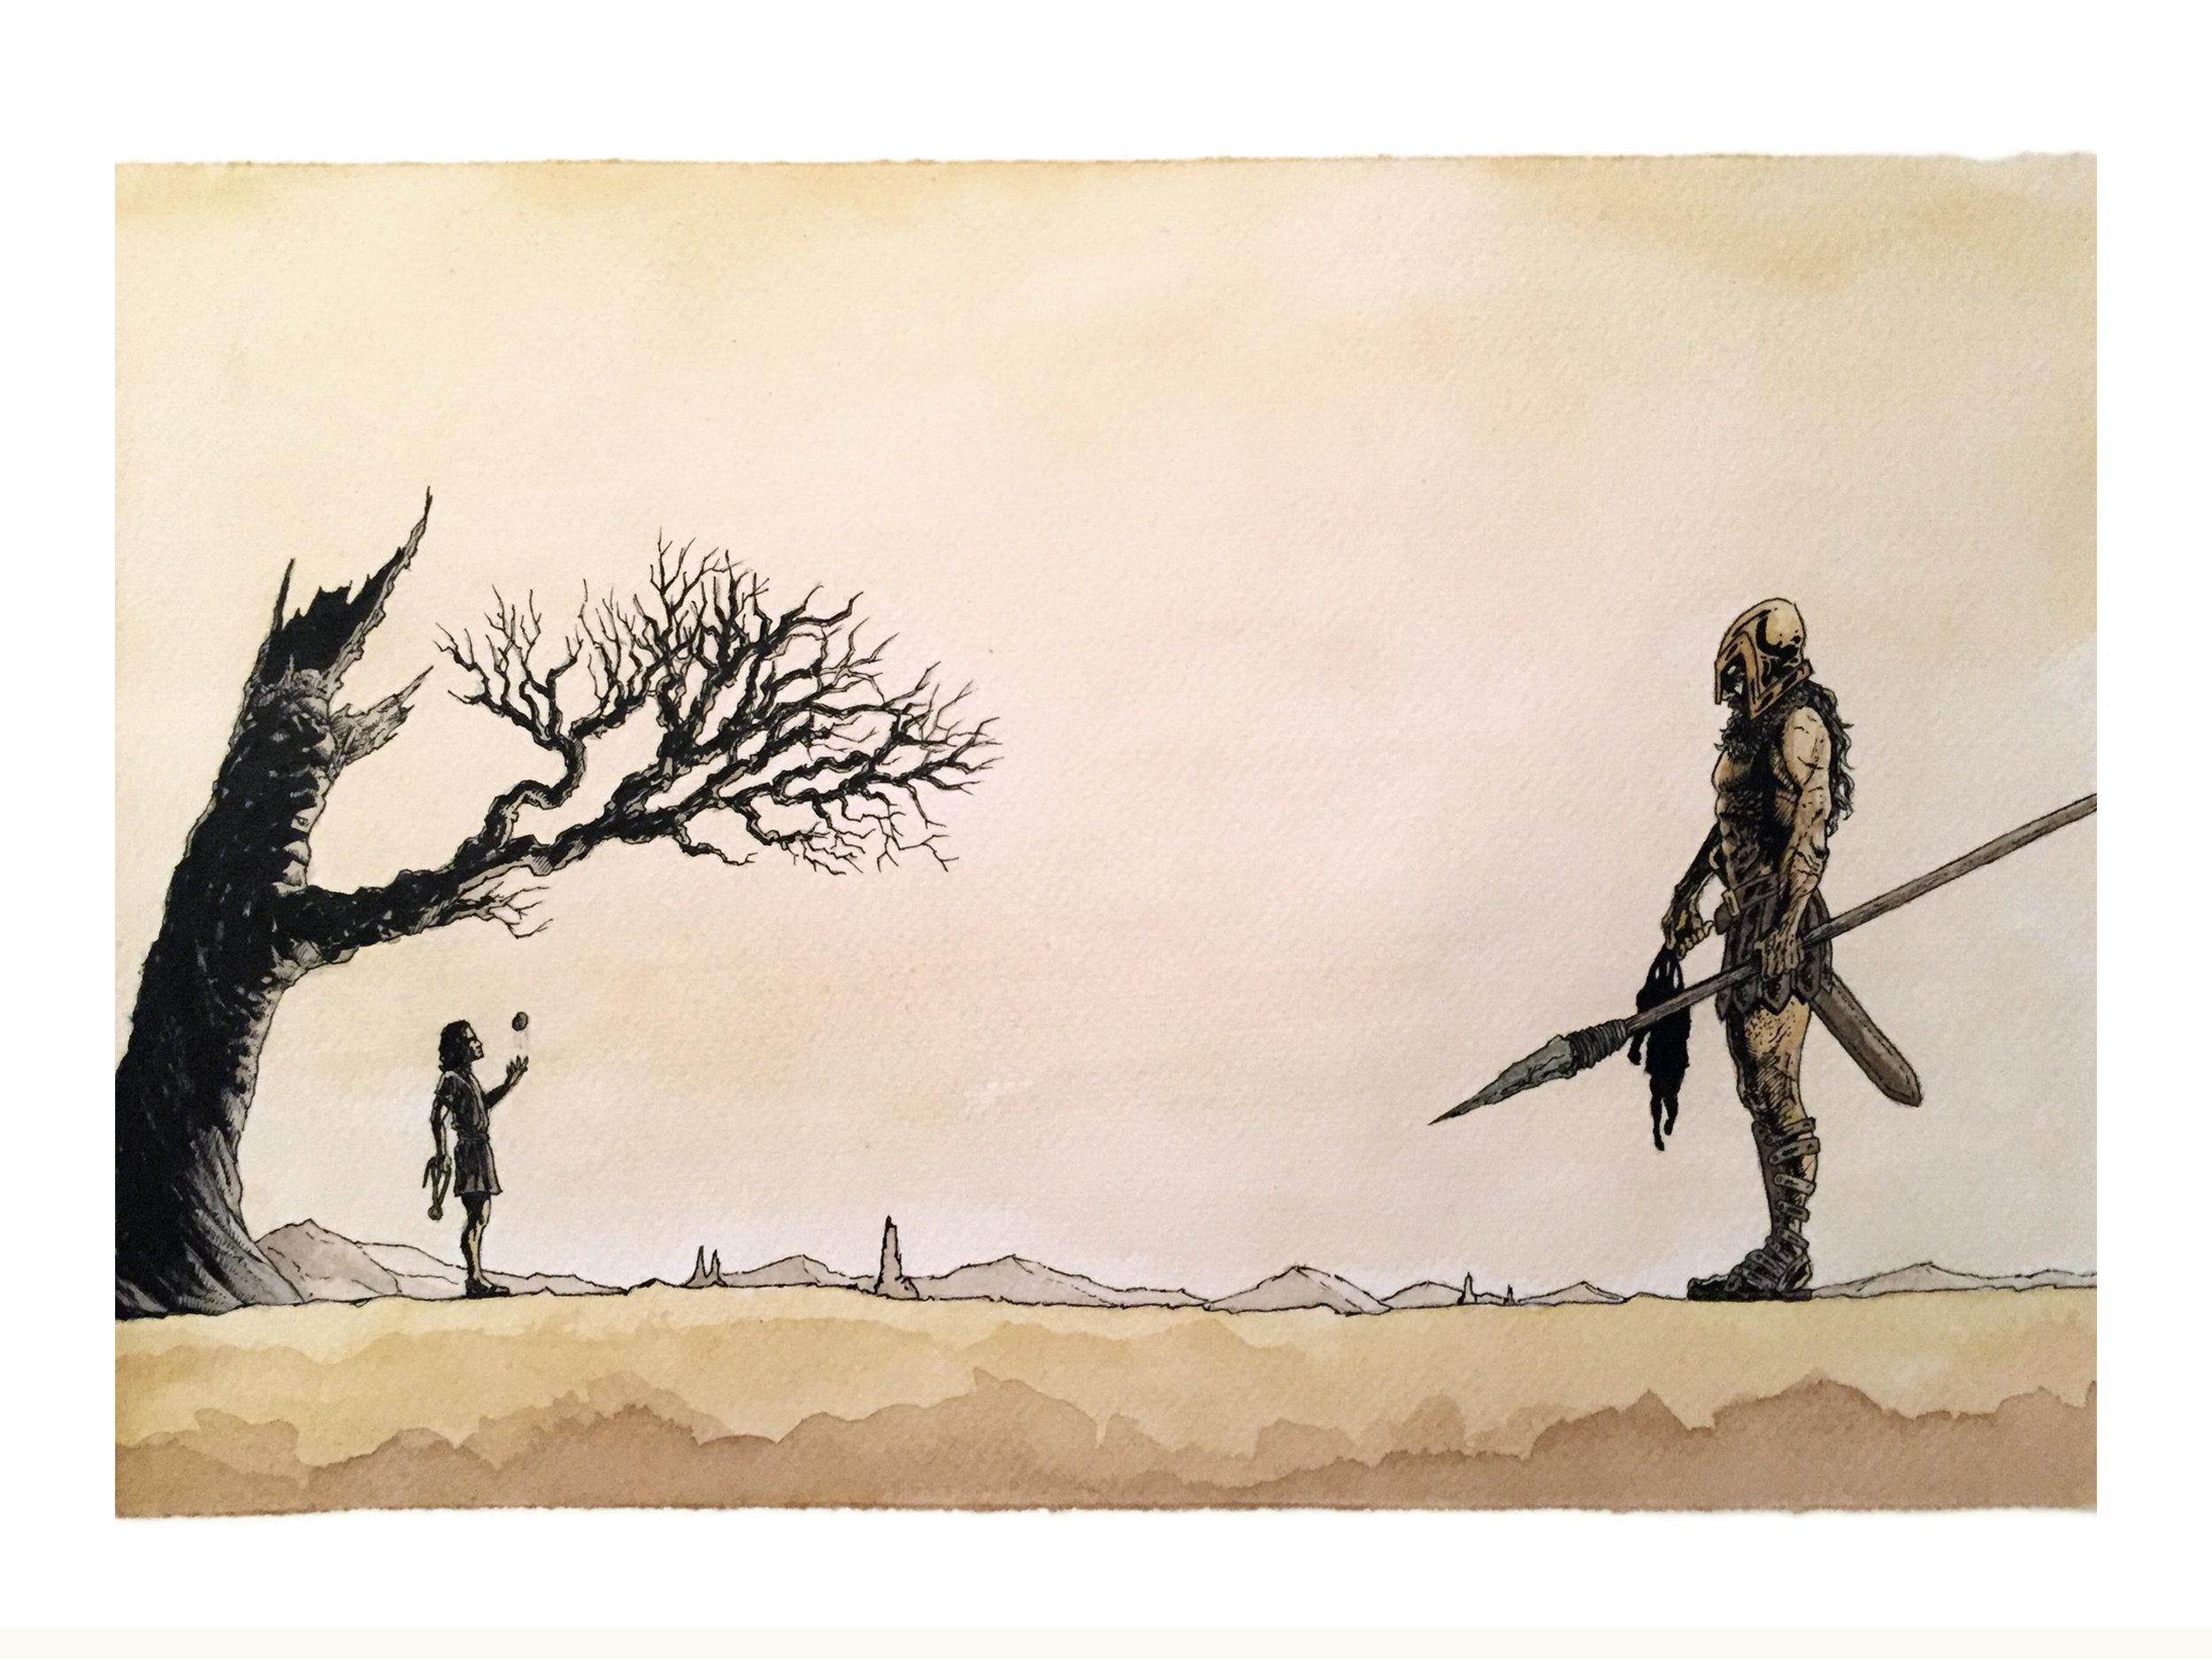 David and Goliath 1-01.jpg